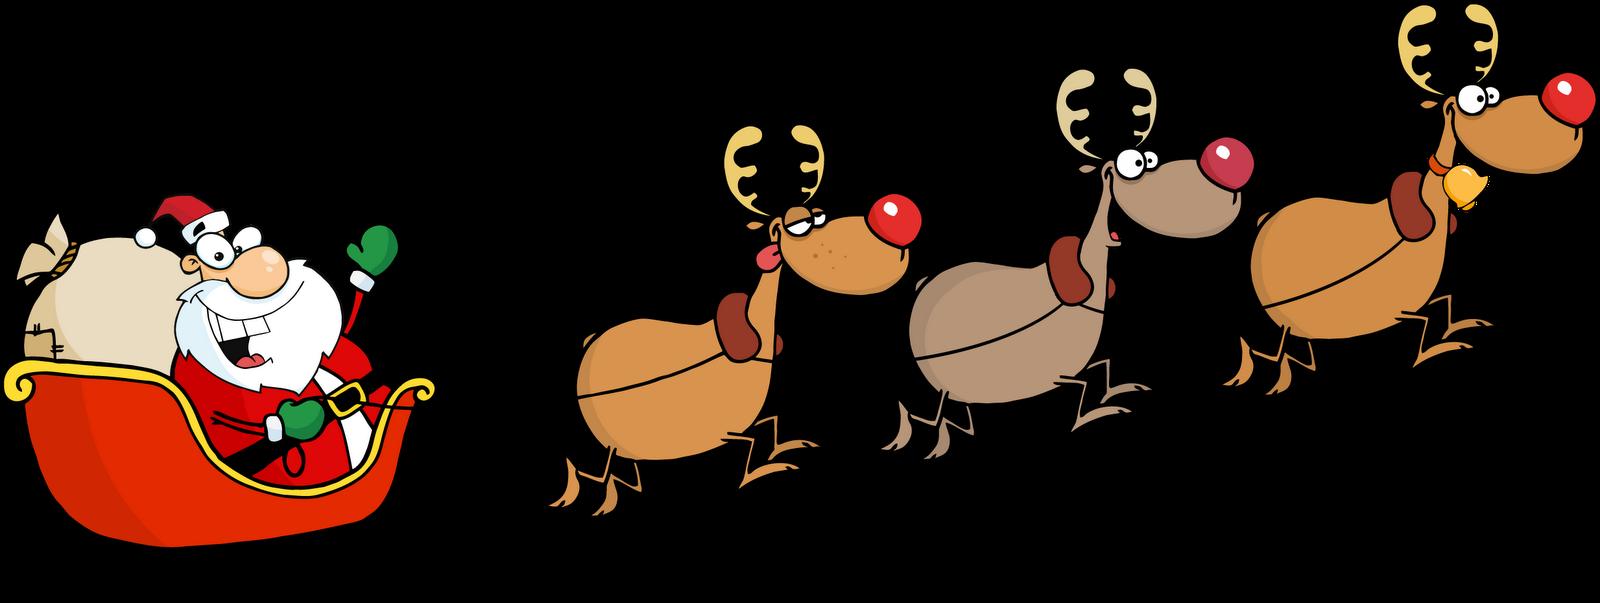 Clipart reindeer christmas image freeuse ForgetMeNot: Christmas reindeer image freeuse